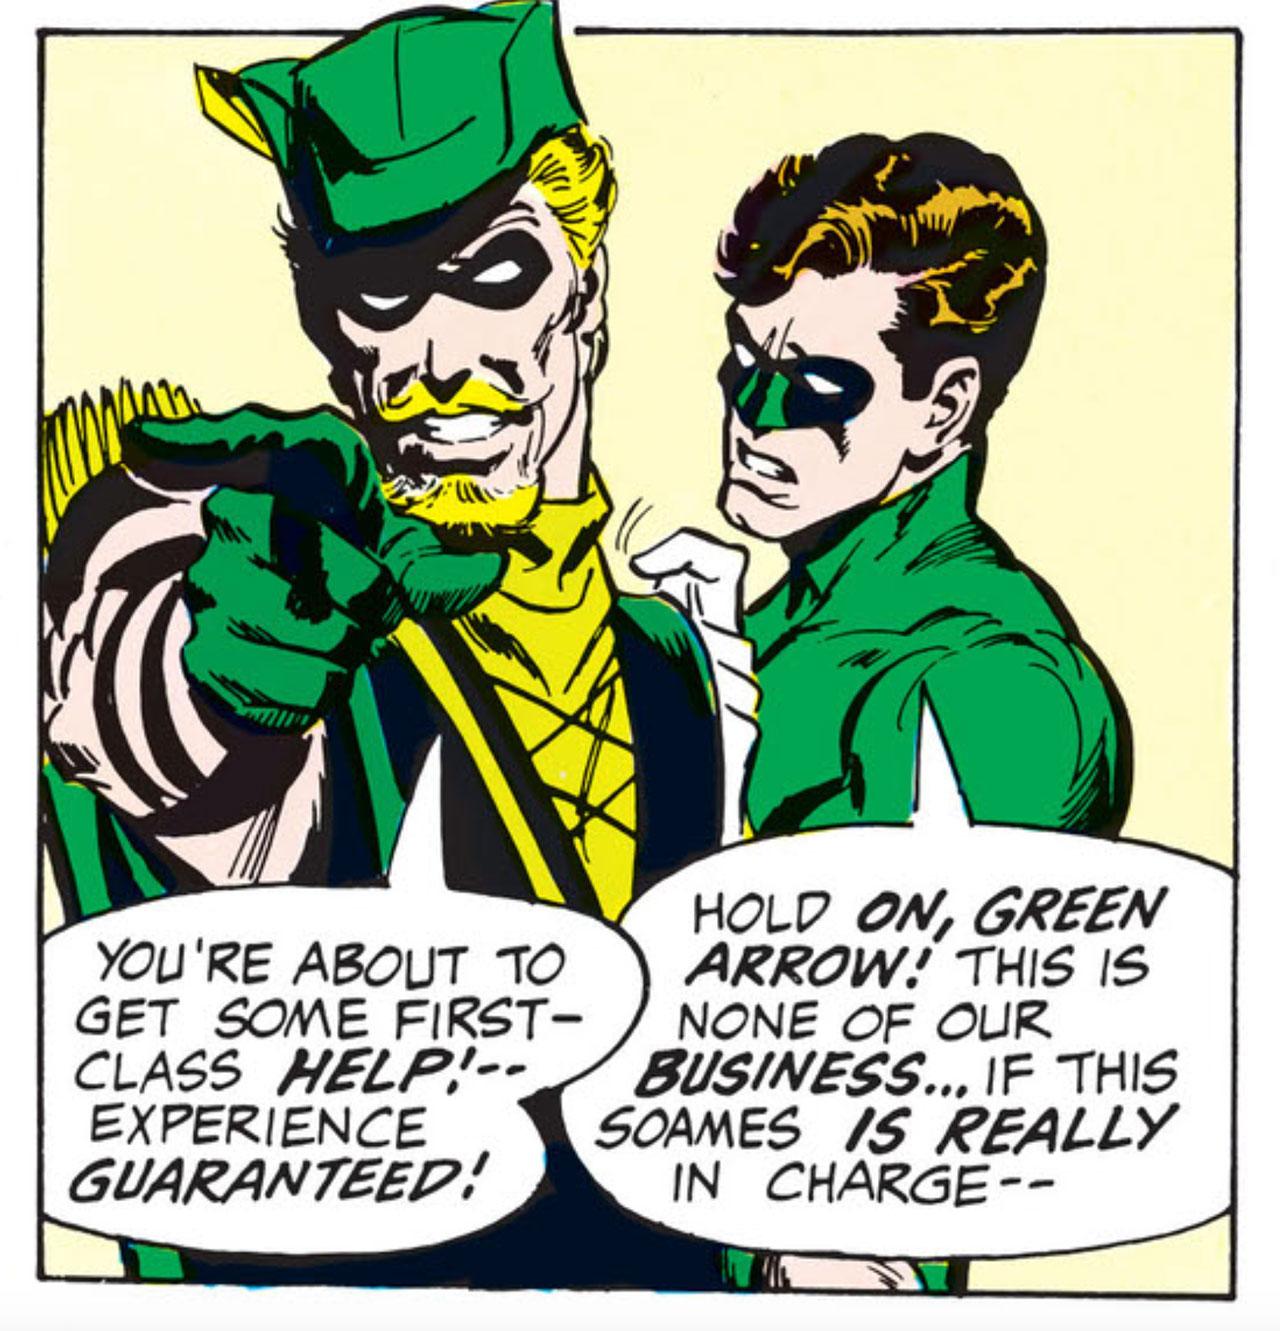 Green-Lantern-and-Greeen-Arrow.jpg